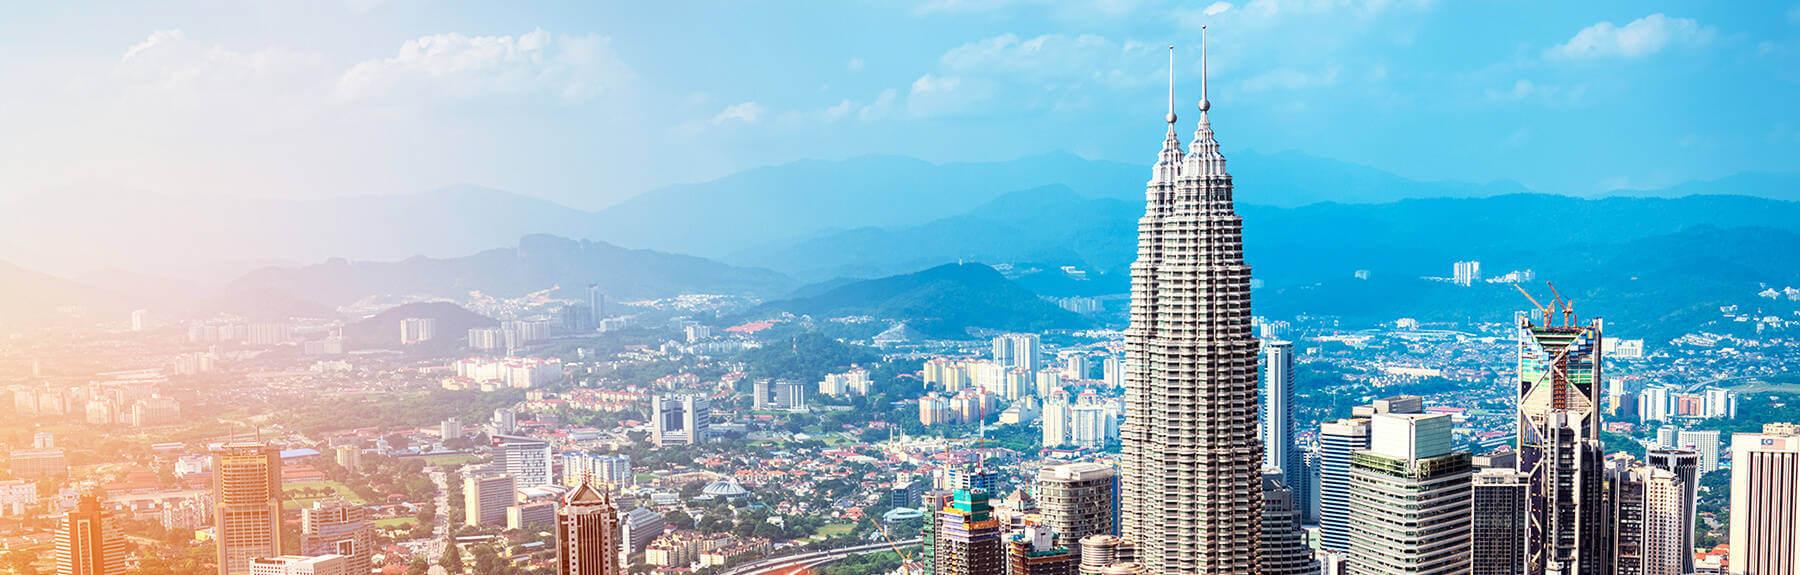 Reeracoen Malaysia